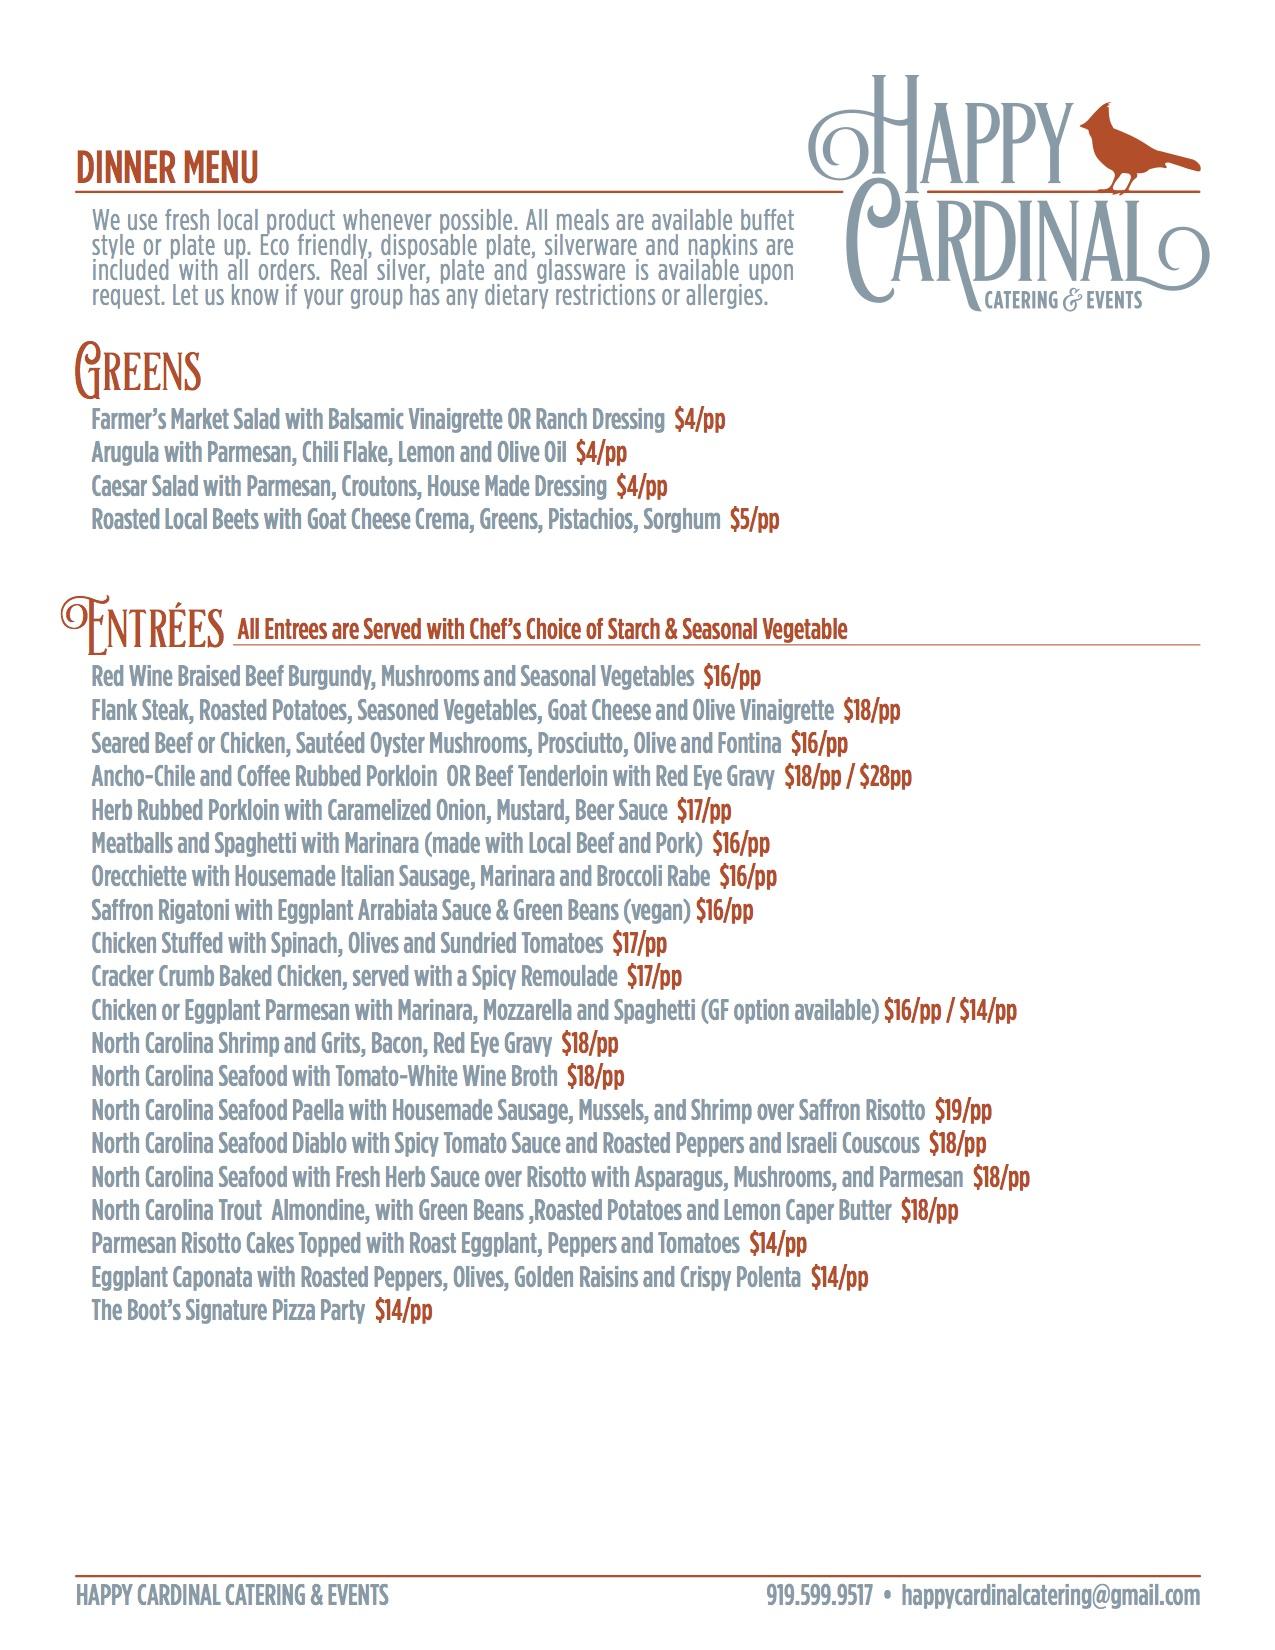 HC dinner menu.jpg